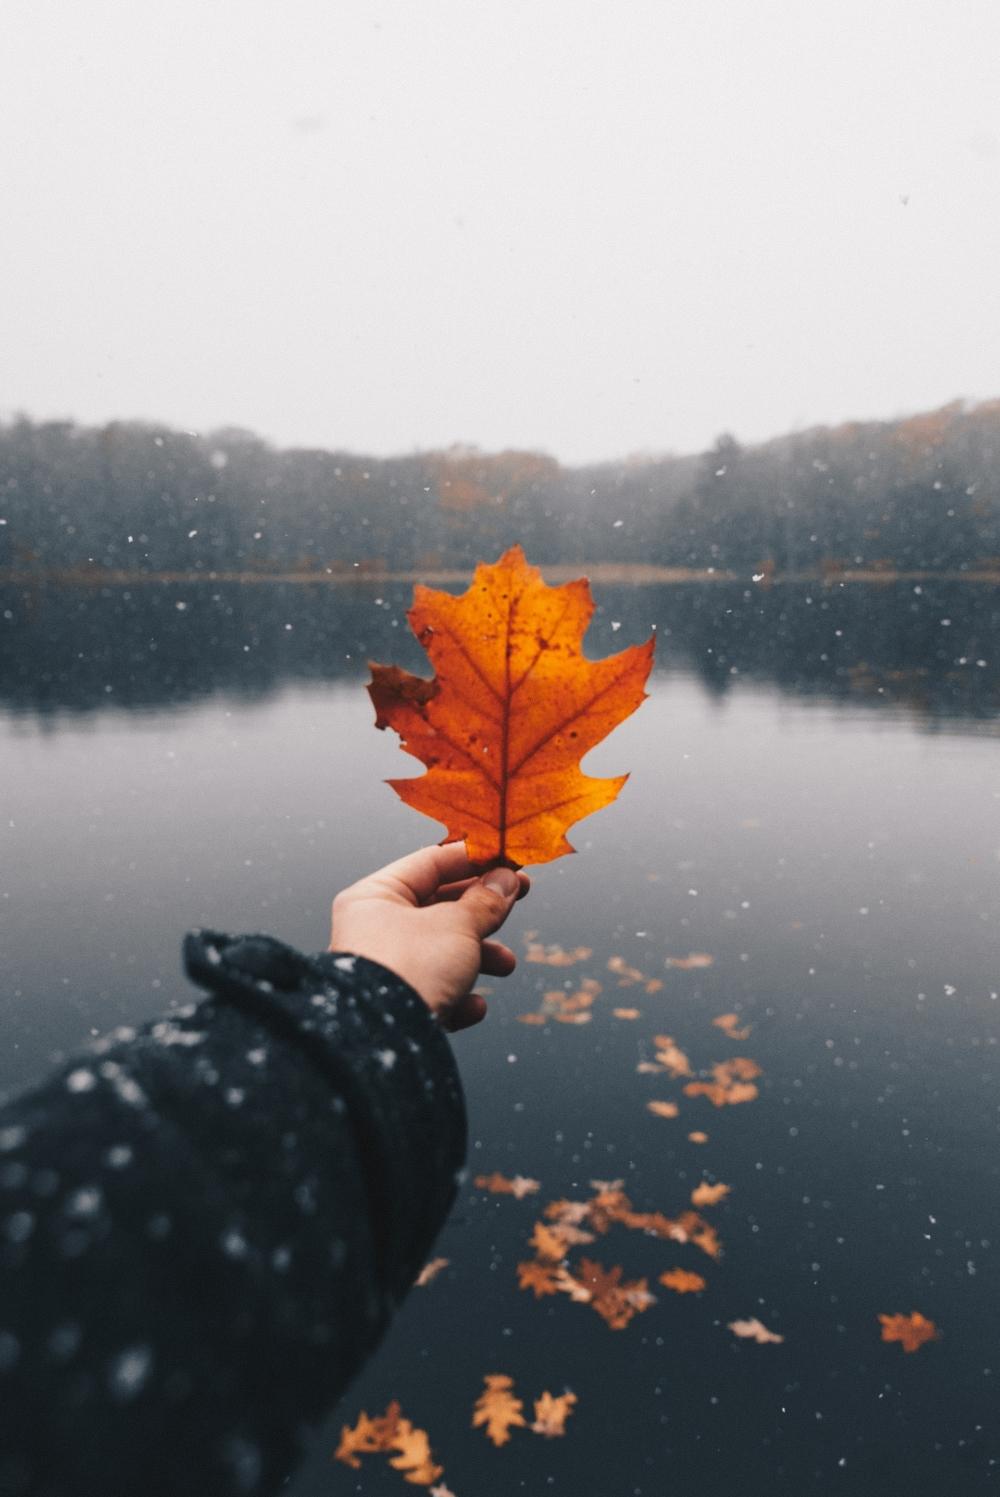 Осенняя фотография без лица